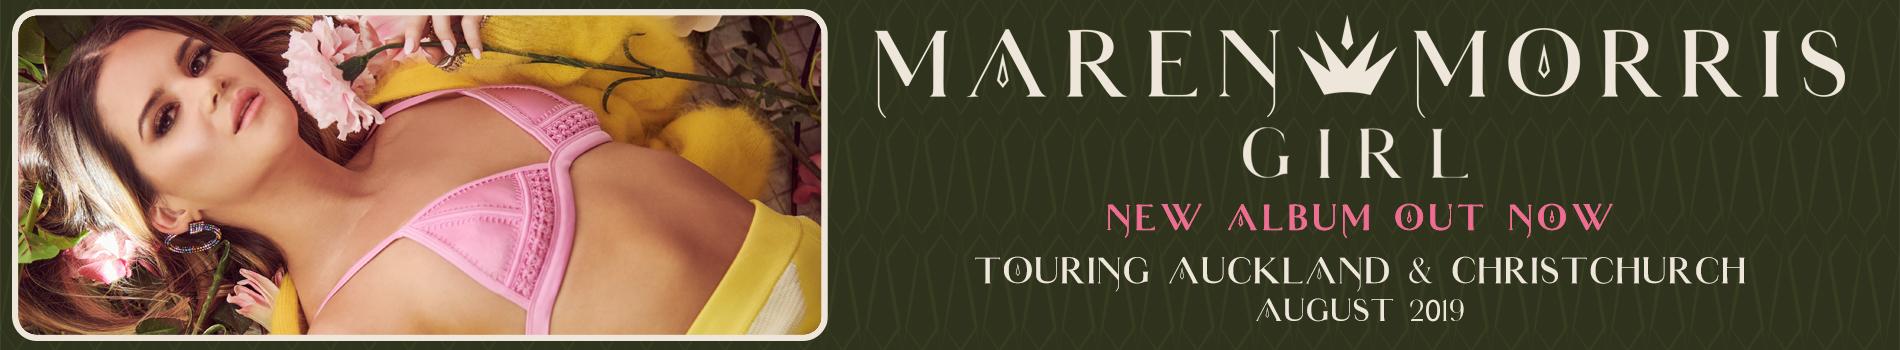 Maren Morris - Masthead Banner